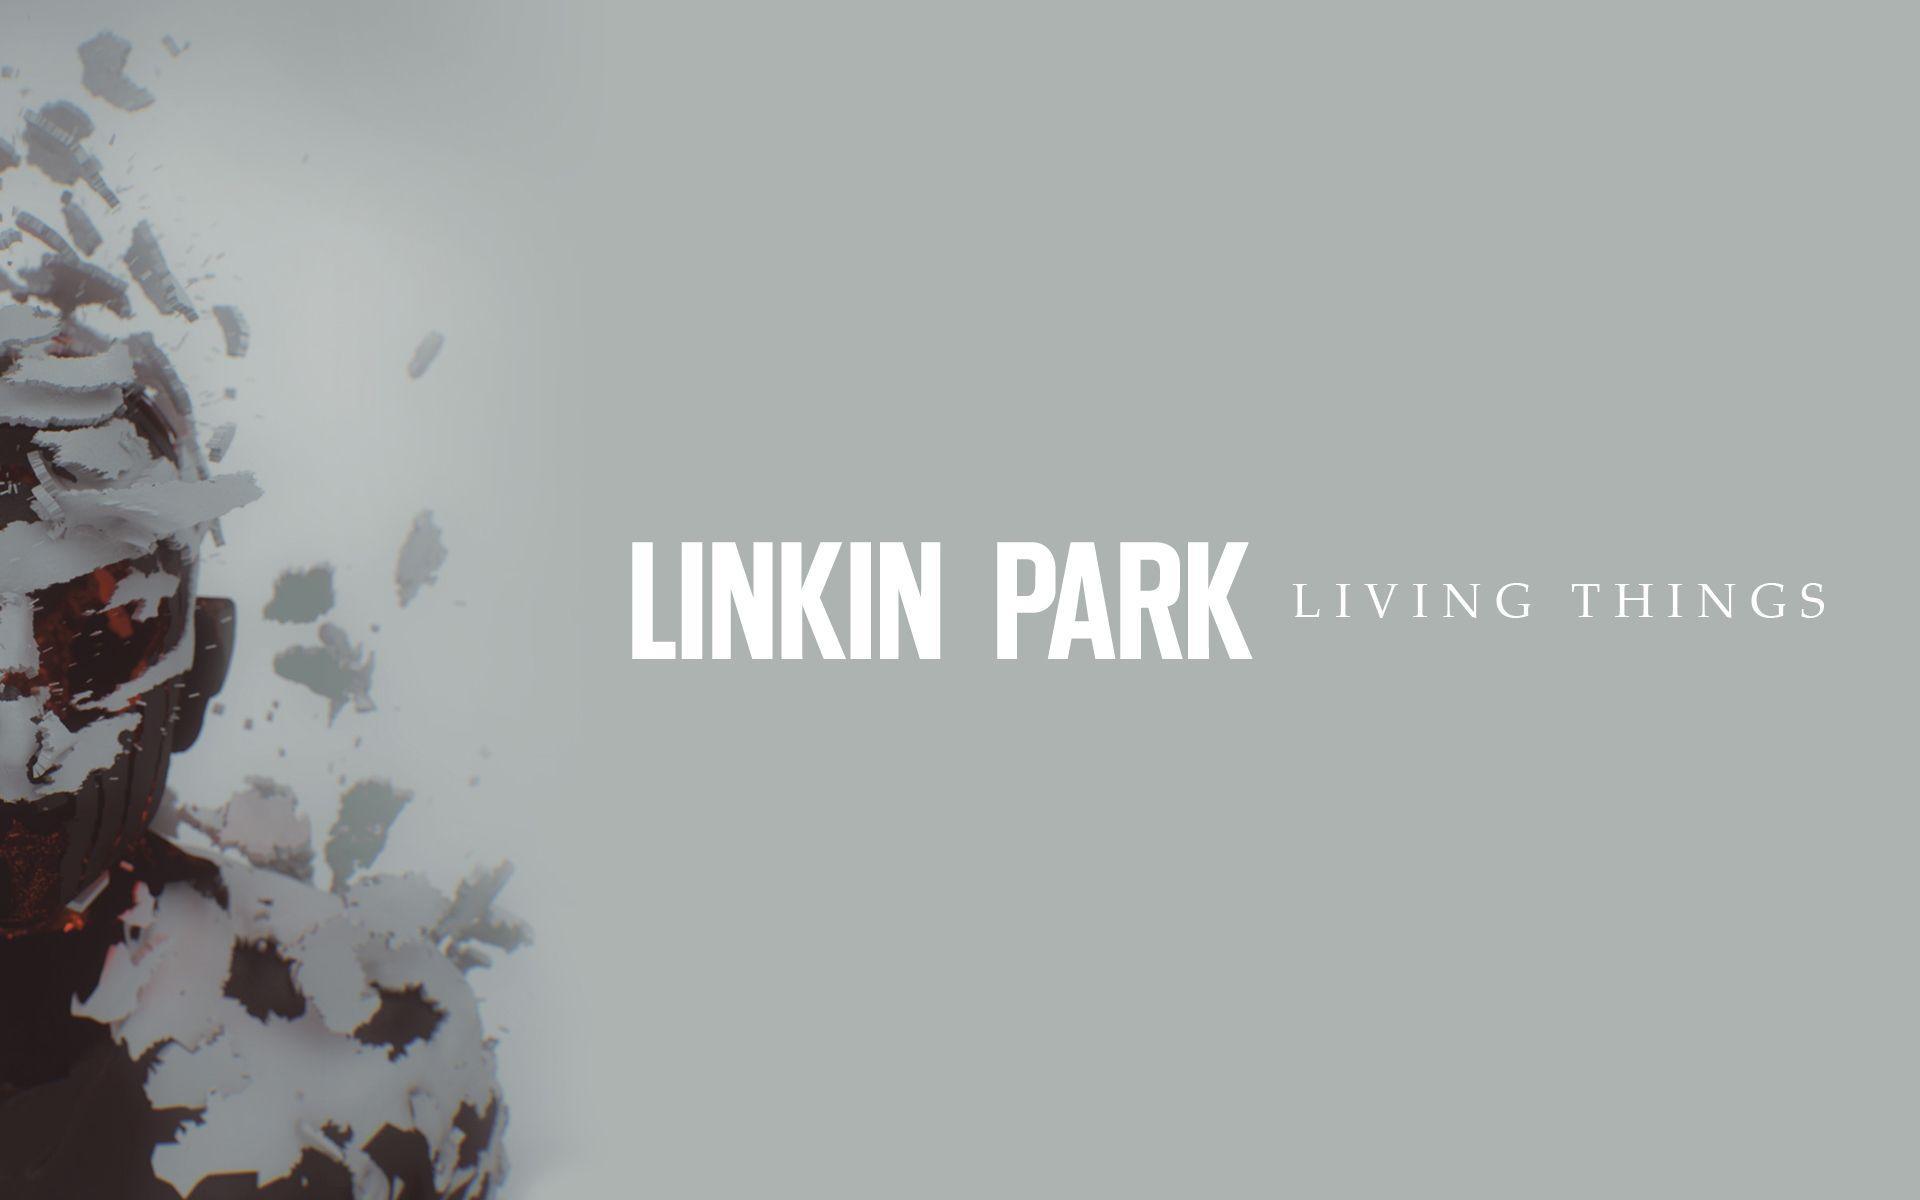 linkin park logo 2017 wallpapers wallpaper cave